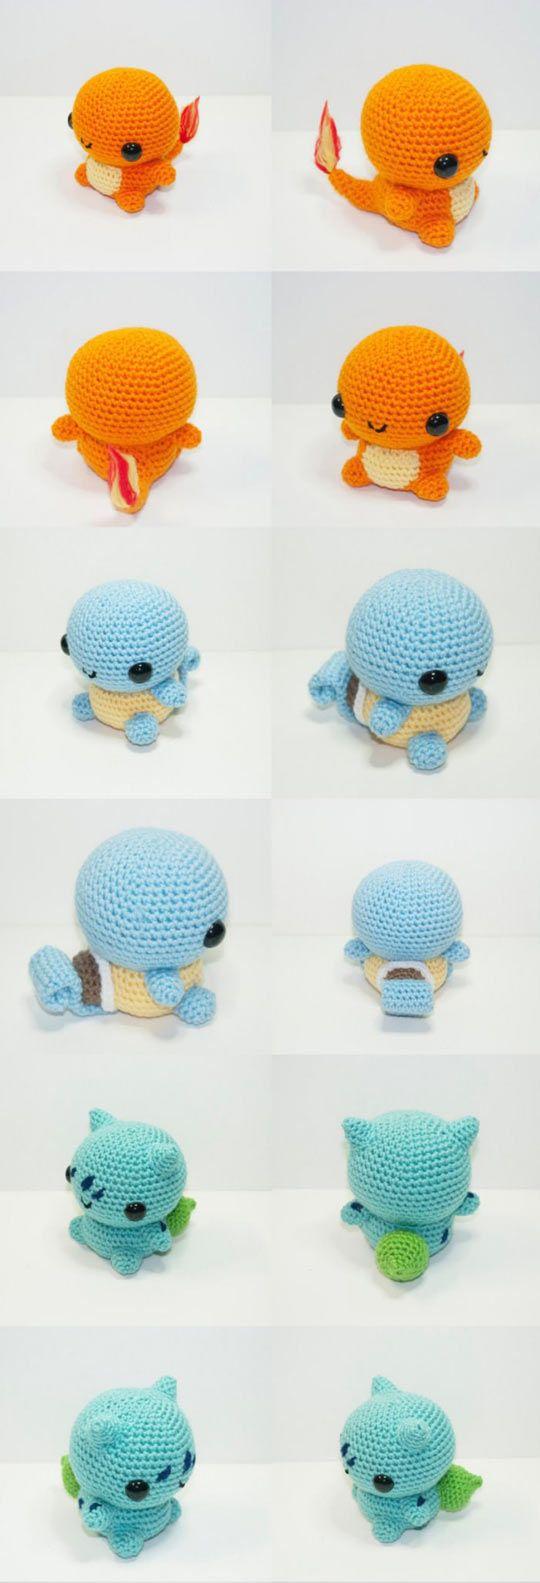 Some Knitted Pokémons | Belenes, Patrones amigurumi y Espere